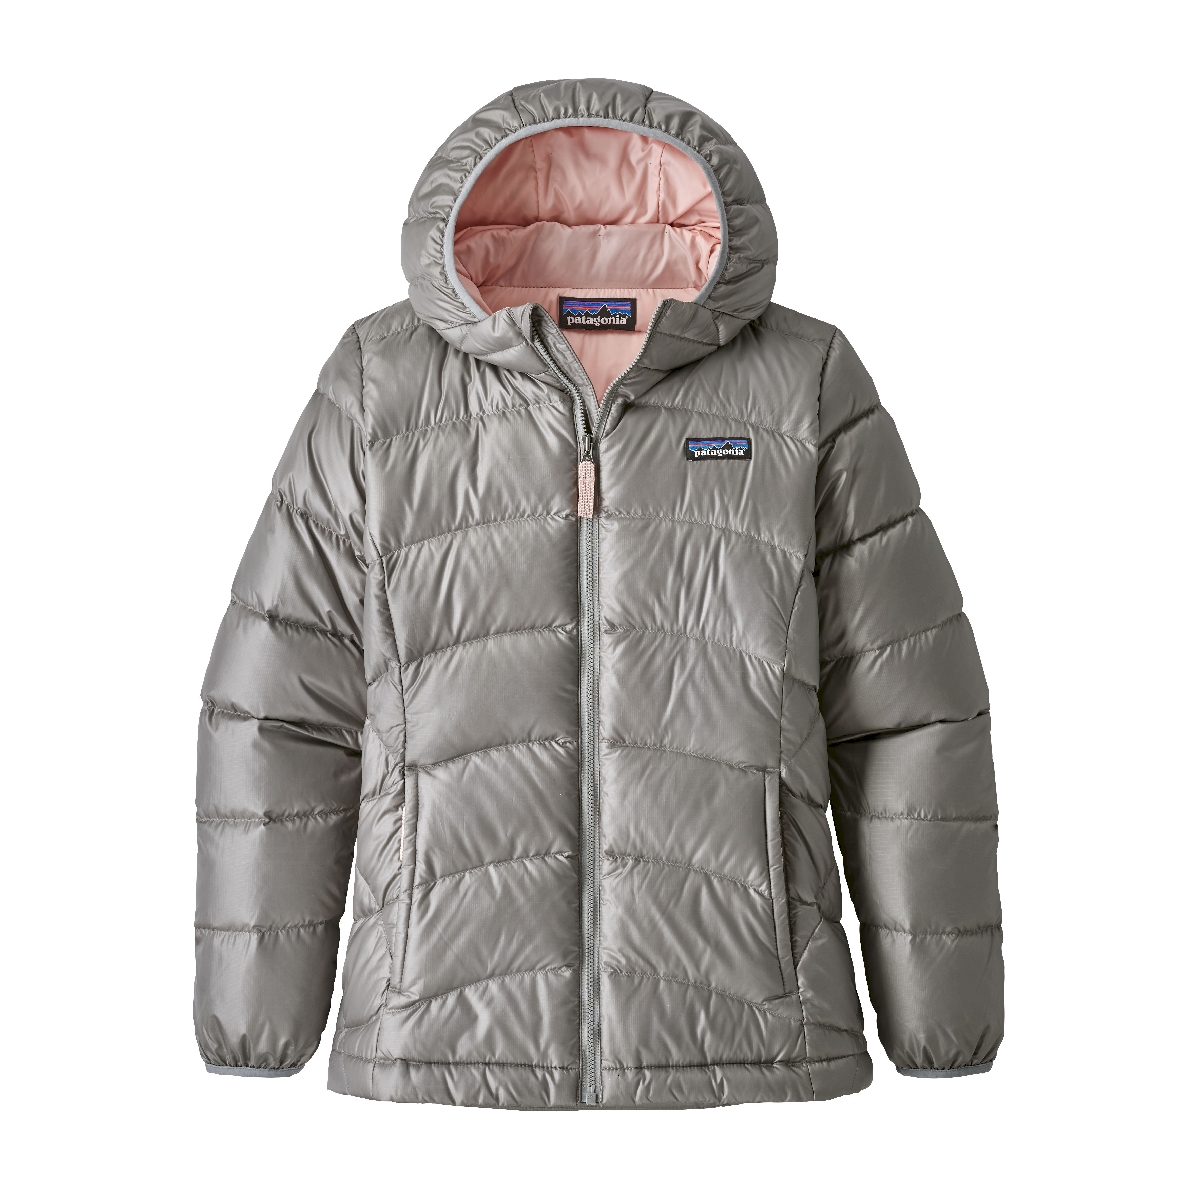 Patagonia Girls' Hi-Loft Down Sweater Hoody - Doudoune fille